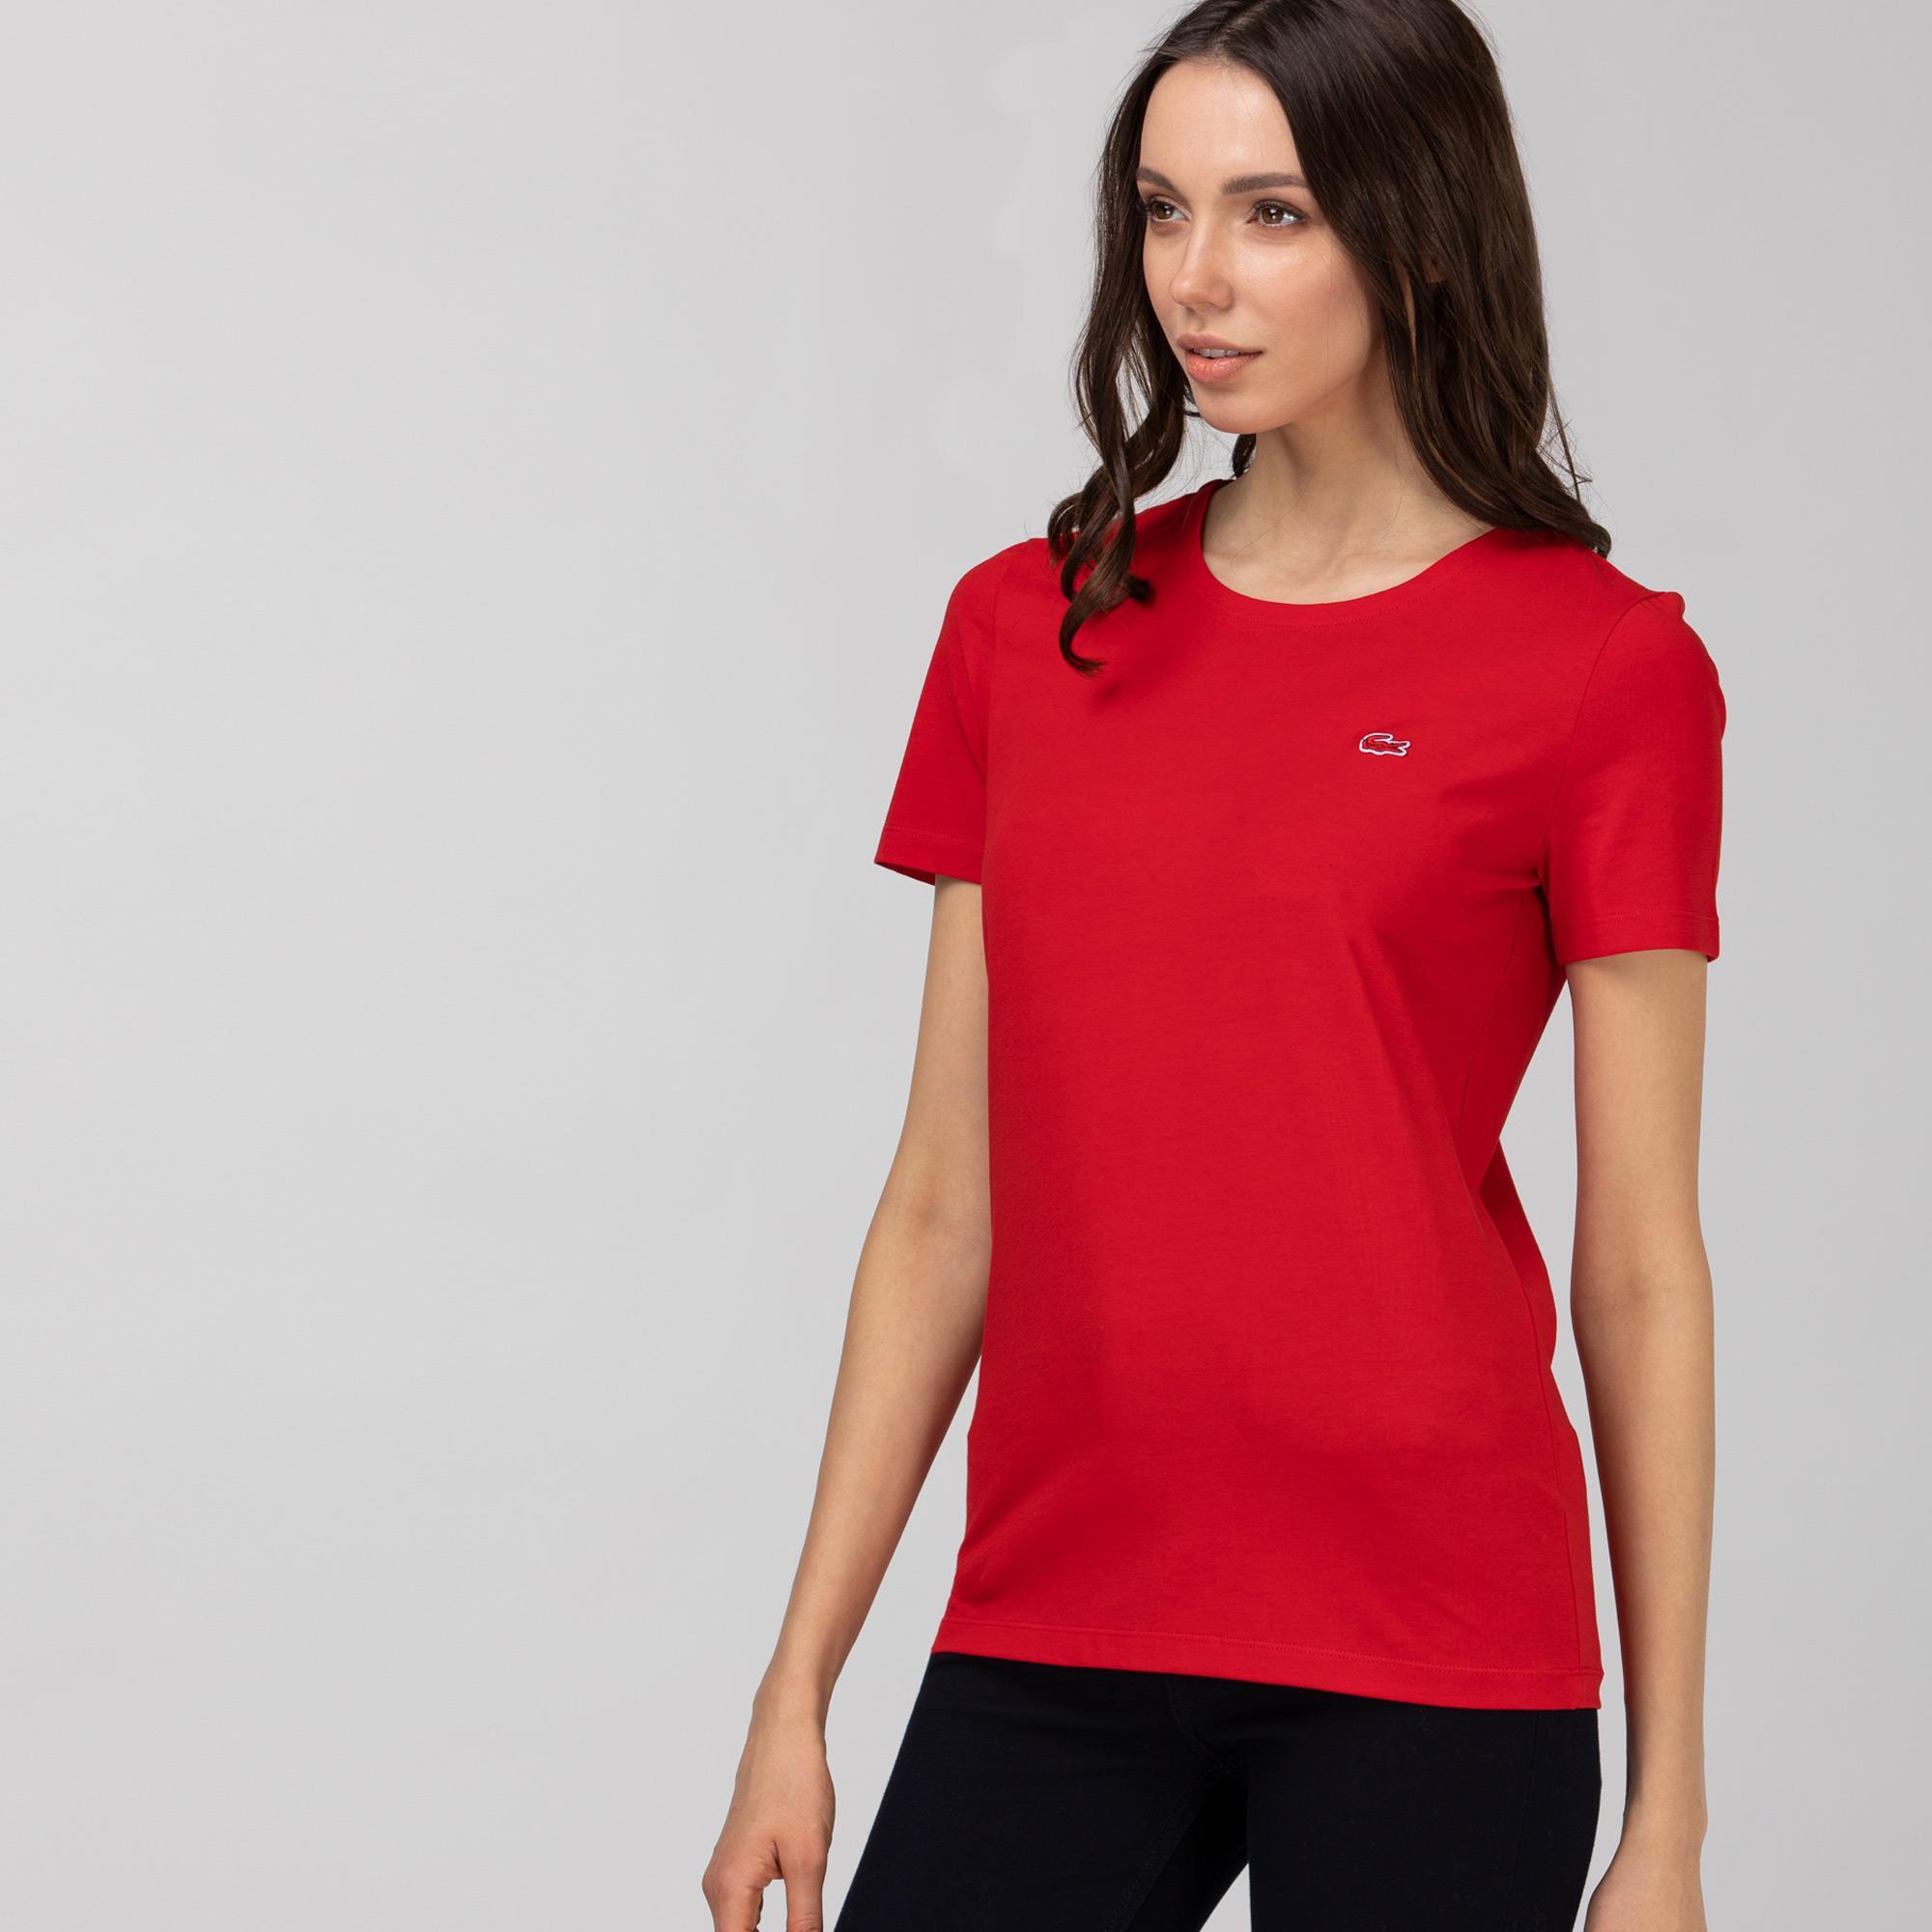 Lacoste Kadın Slim Fit Bisiklet Yaka Kırmızı T-Shirt